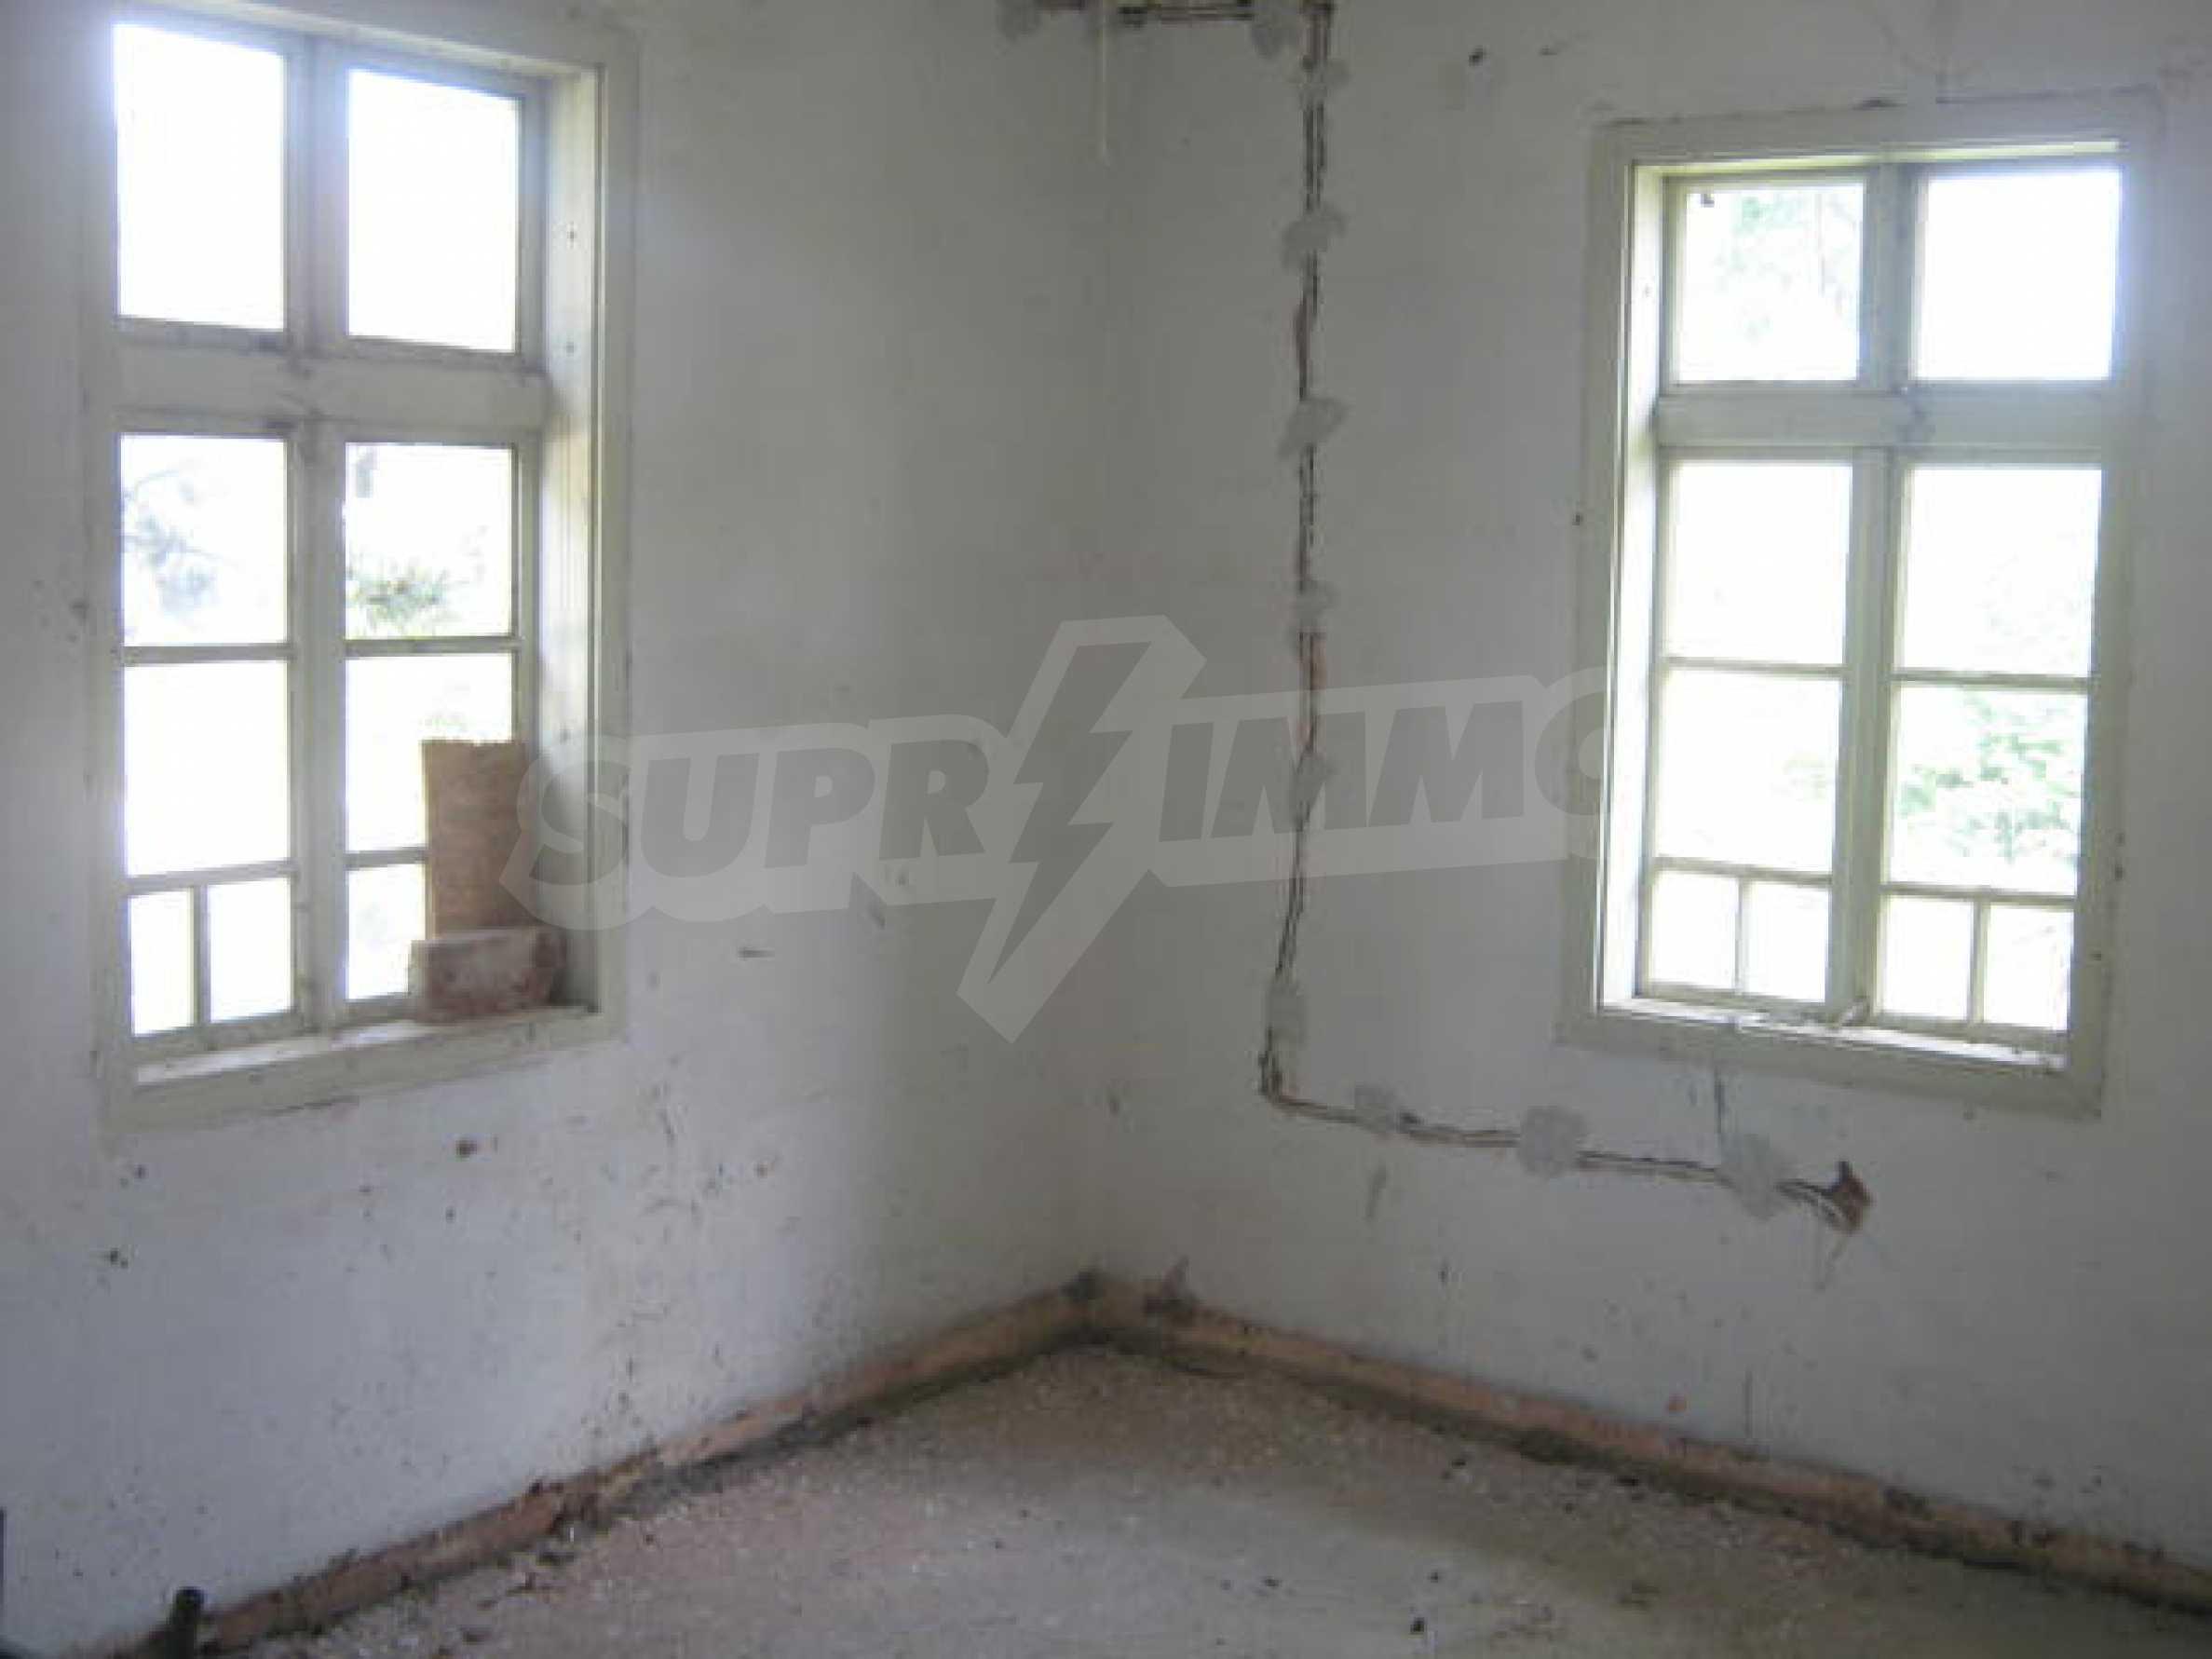 House for sale in village near Vidin 5